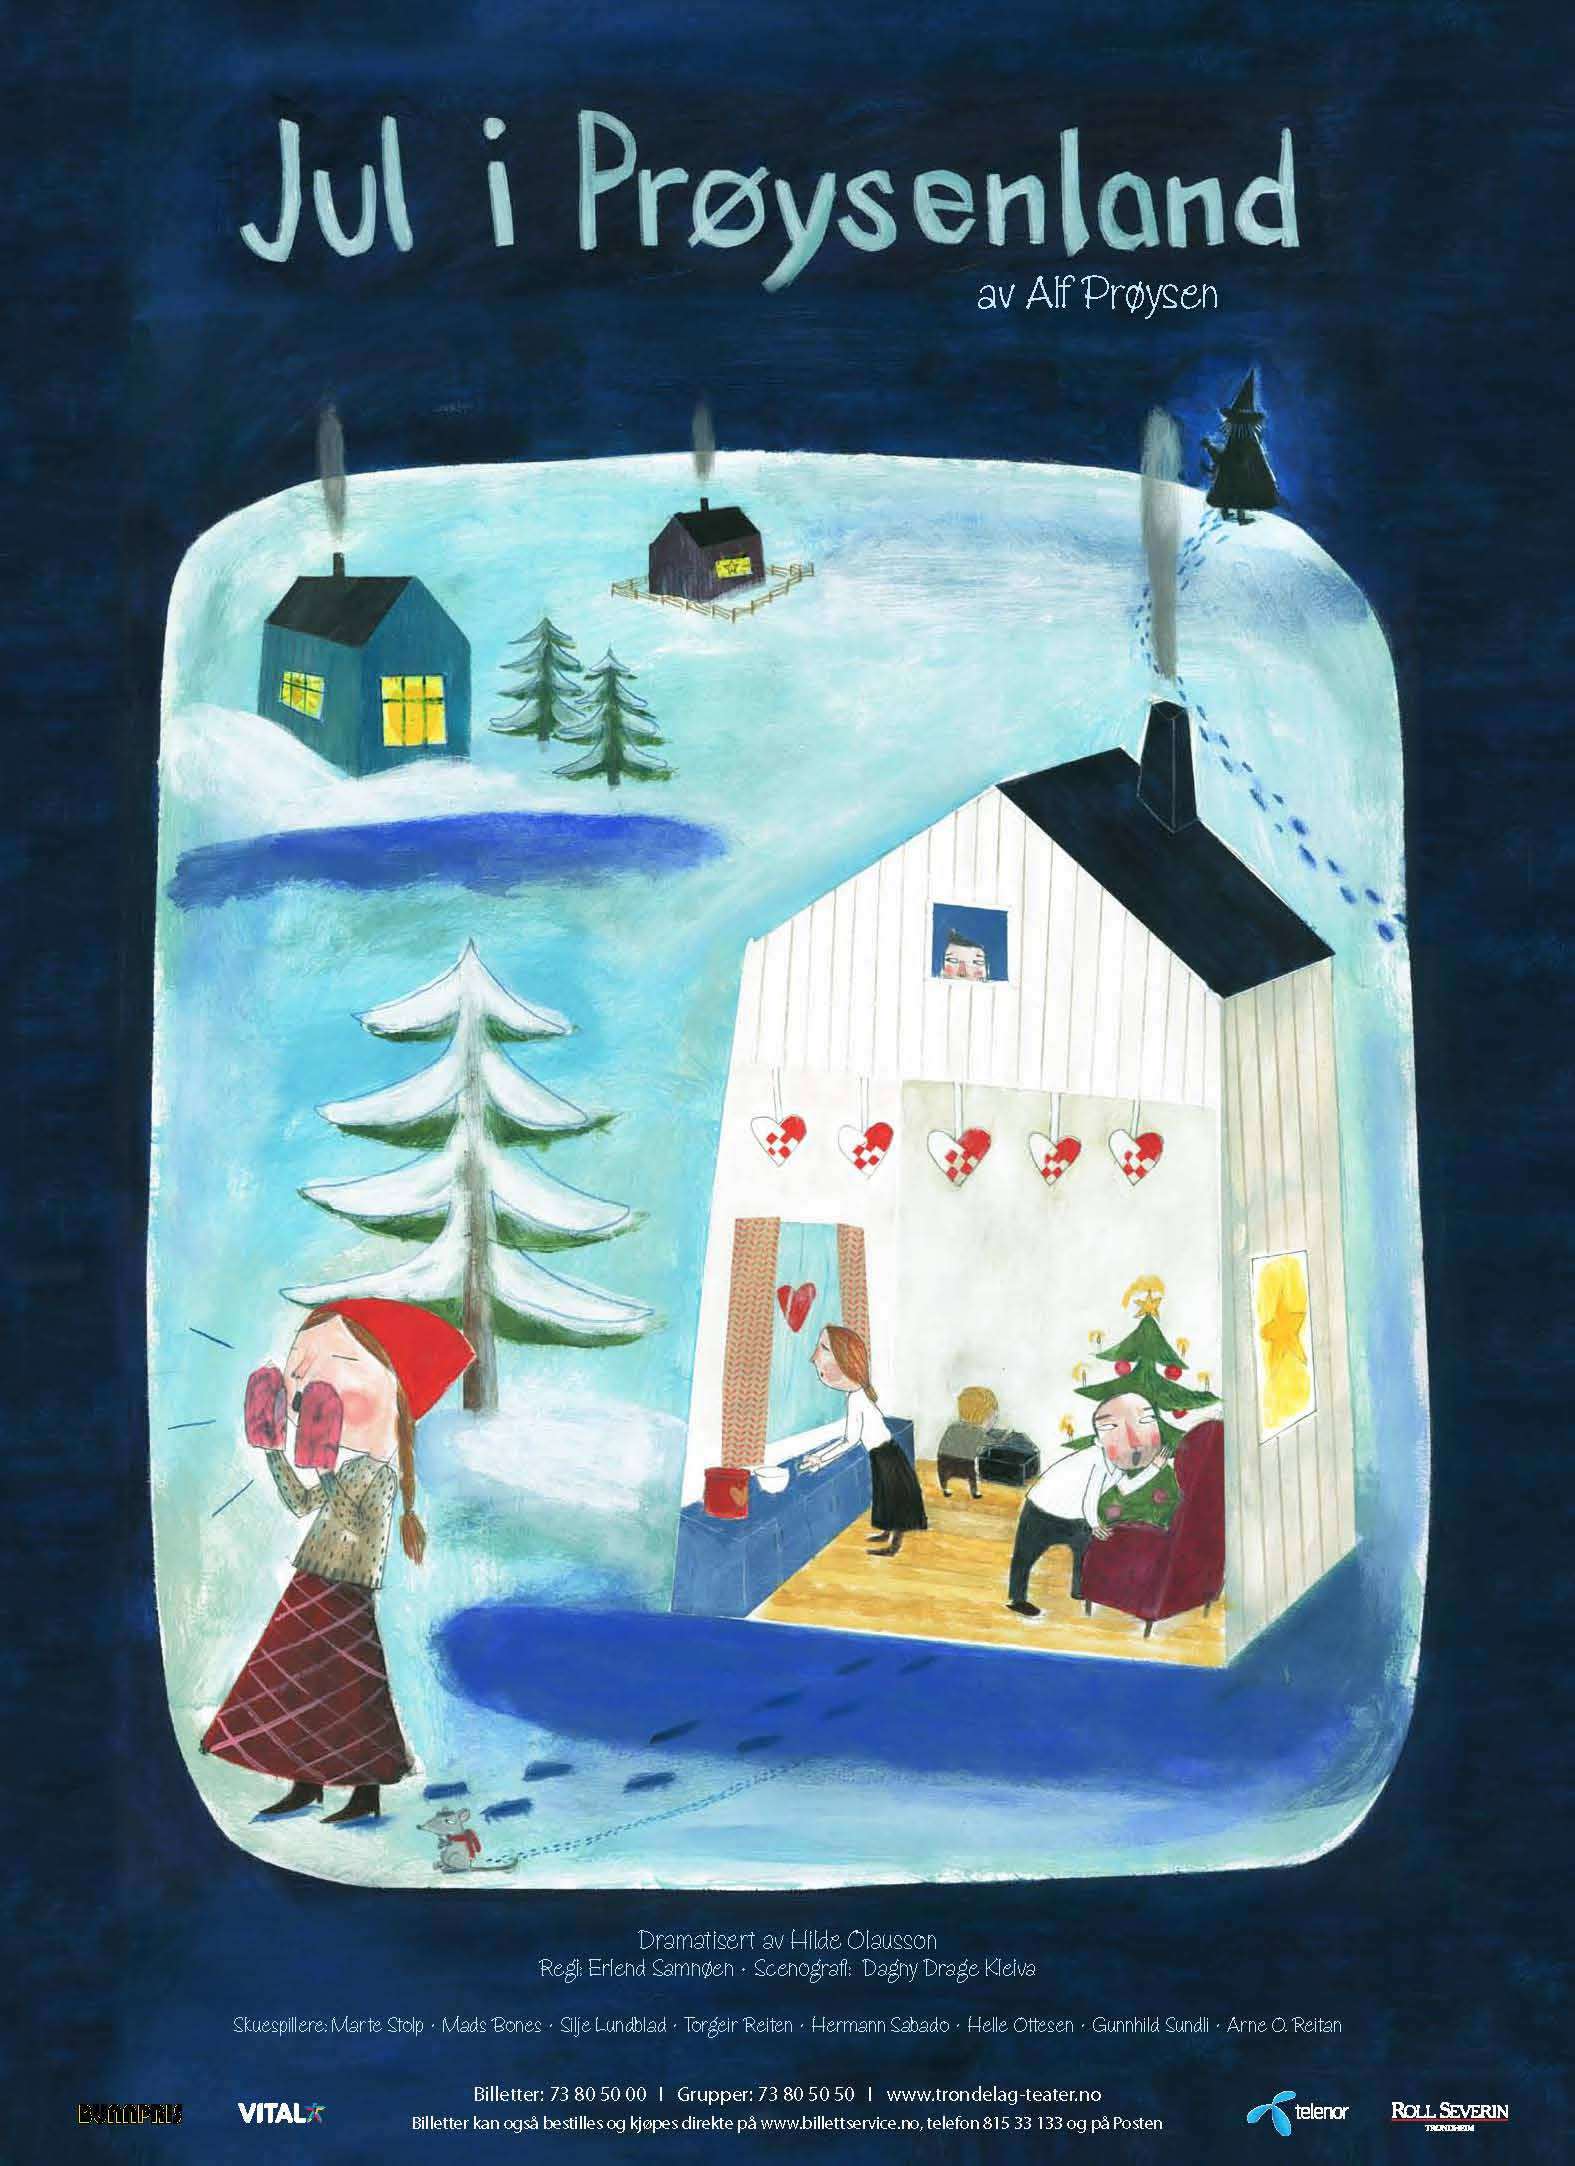 Plakat /Prøysenland, en juleforestilling spilt på Trøndelag Teater 2008-2012  Dialogue/Trøndelag Teater 2008